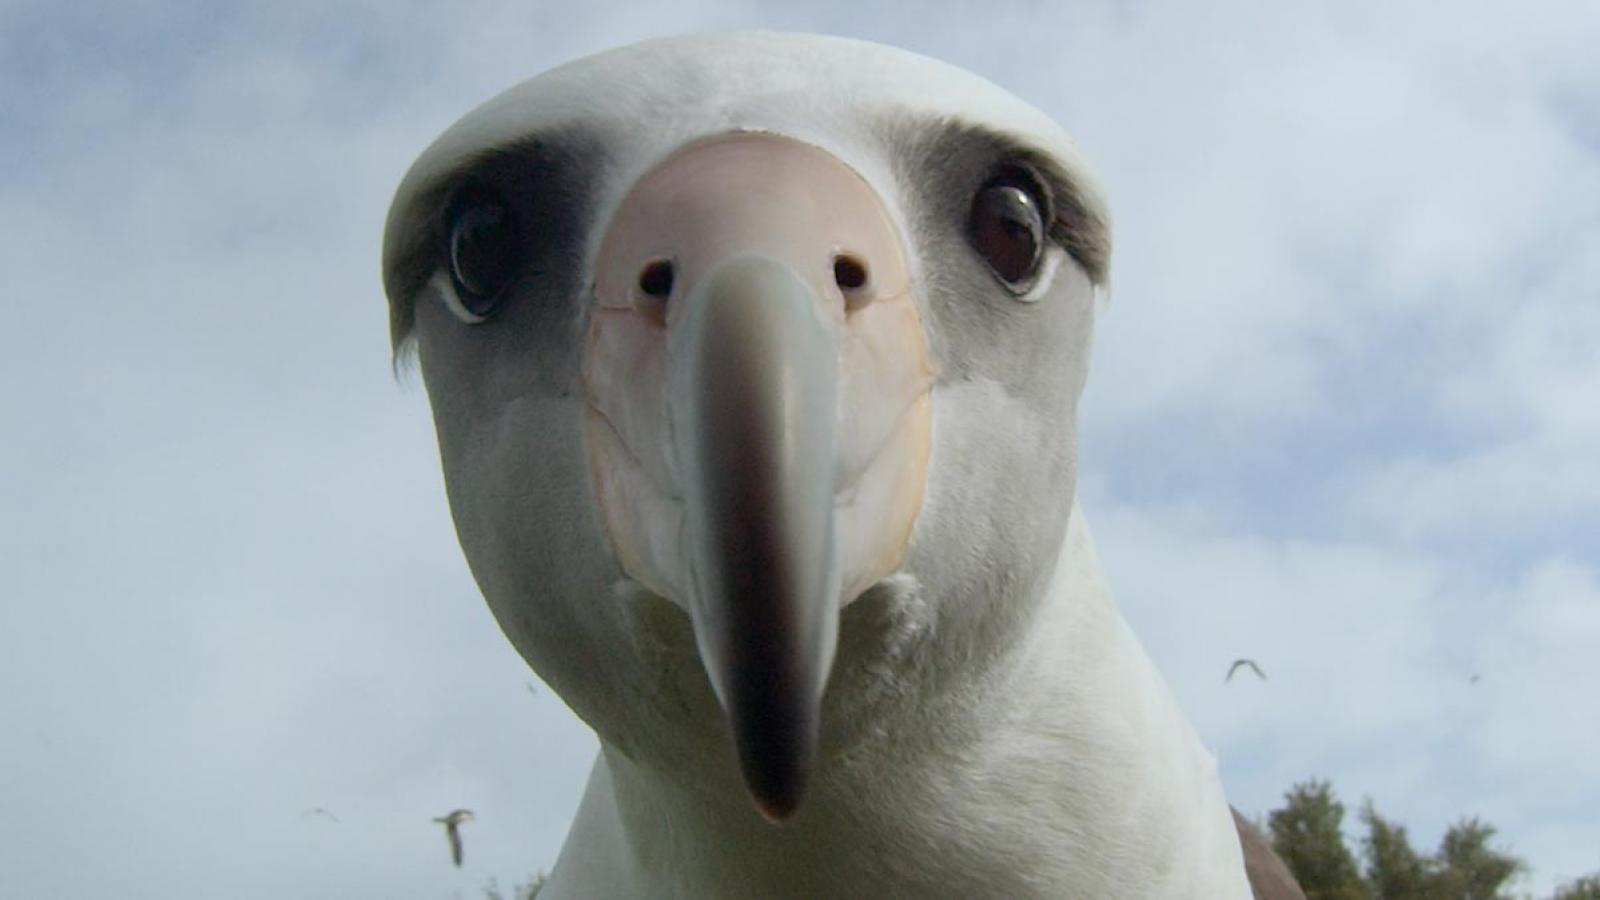 Forumaš iznad u liku životinje - Page 7 MF17-STILL-Albatross2